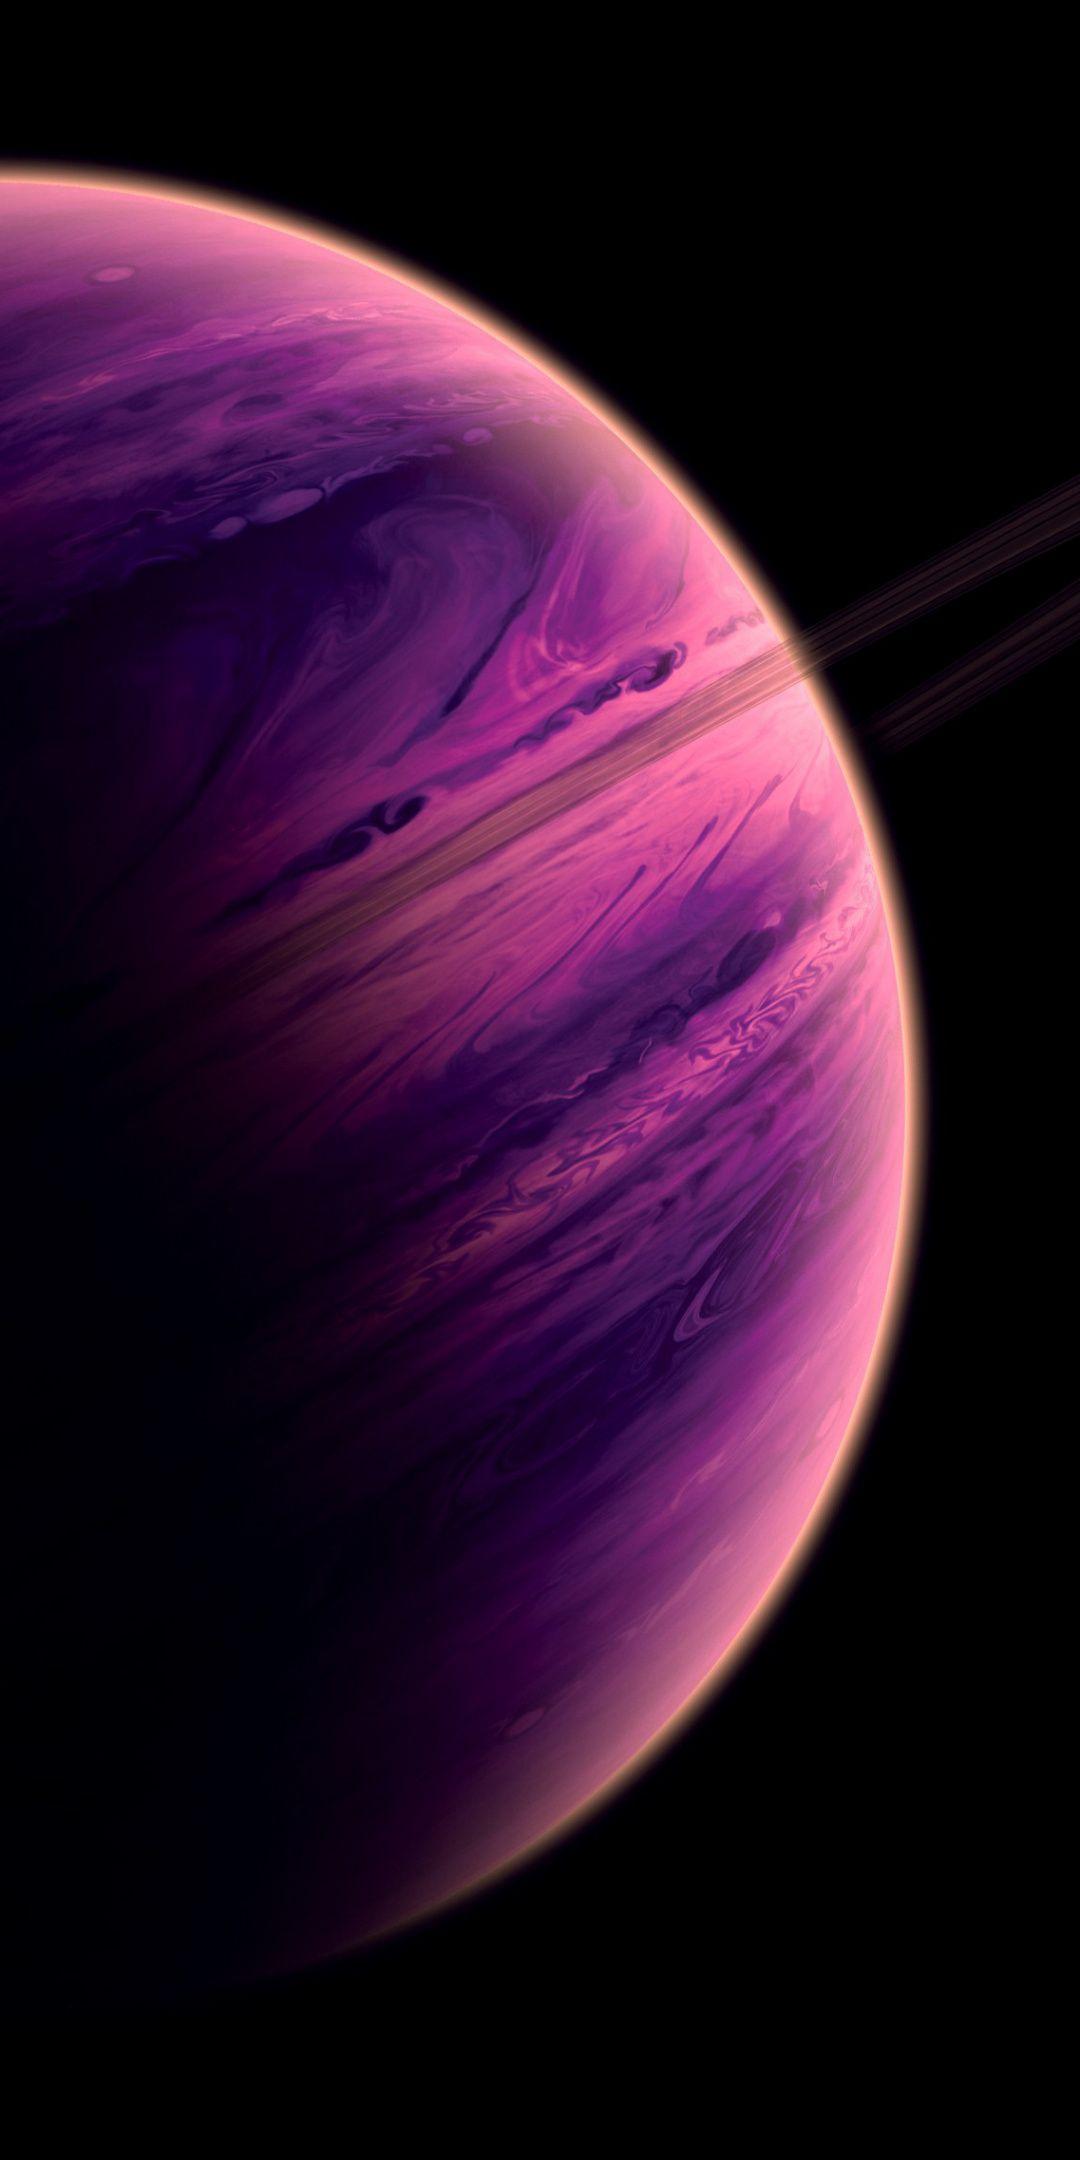 Planet purple, space, fantasy, art, 1080x2160 wallpaper